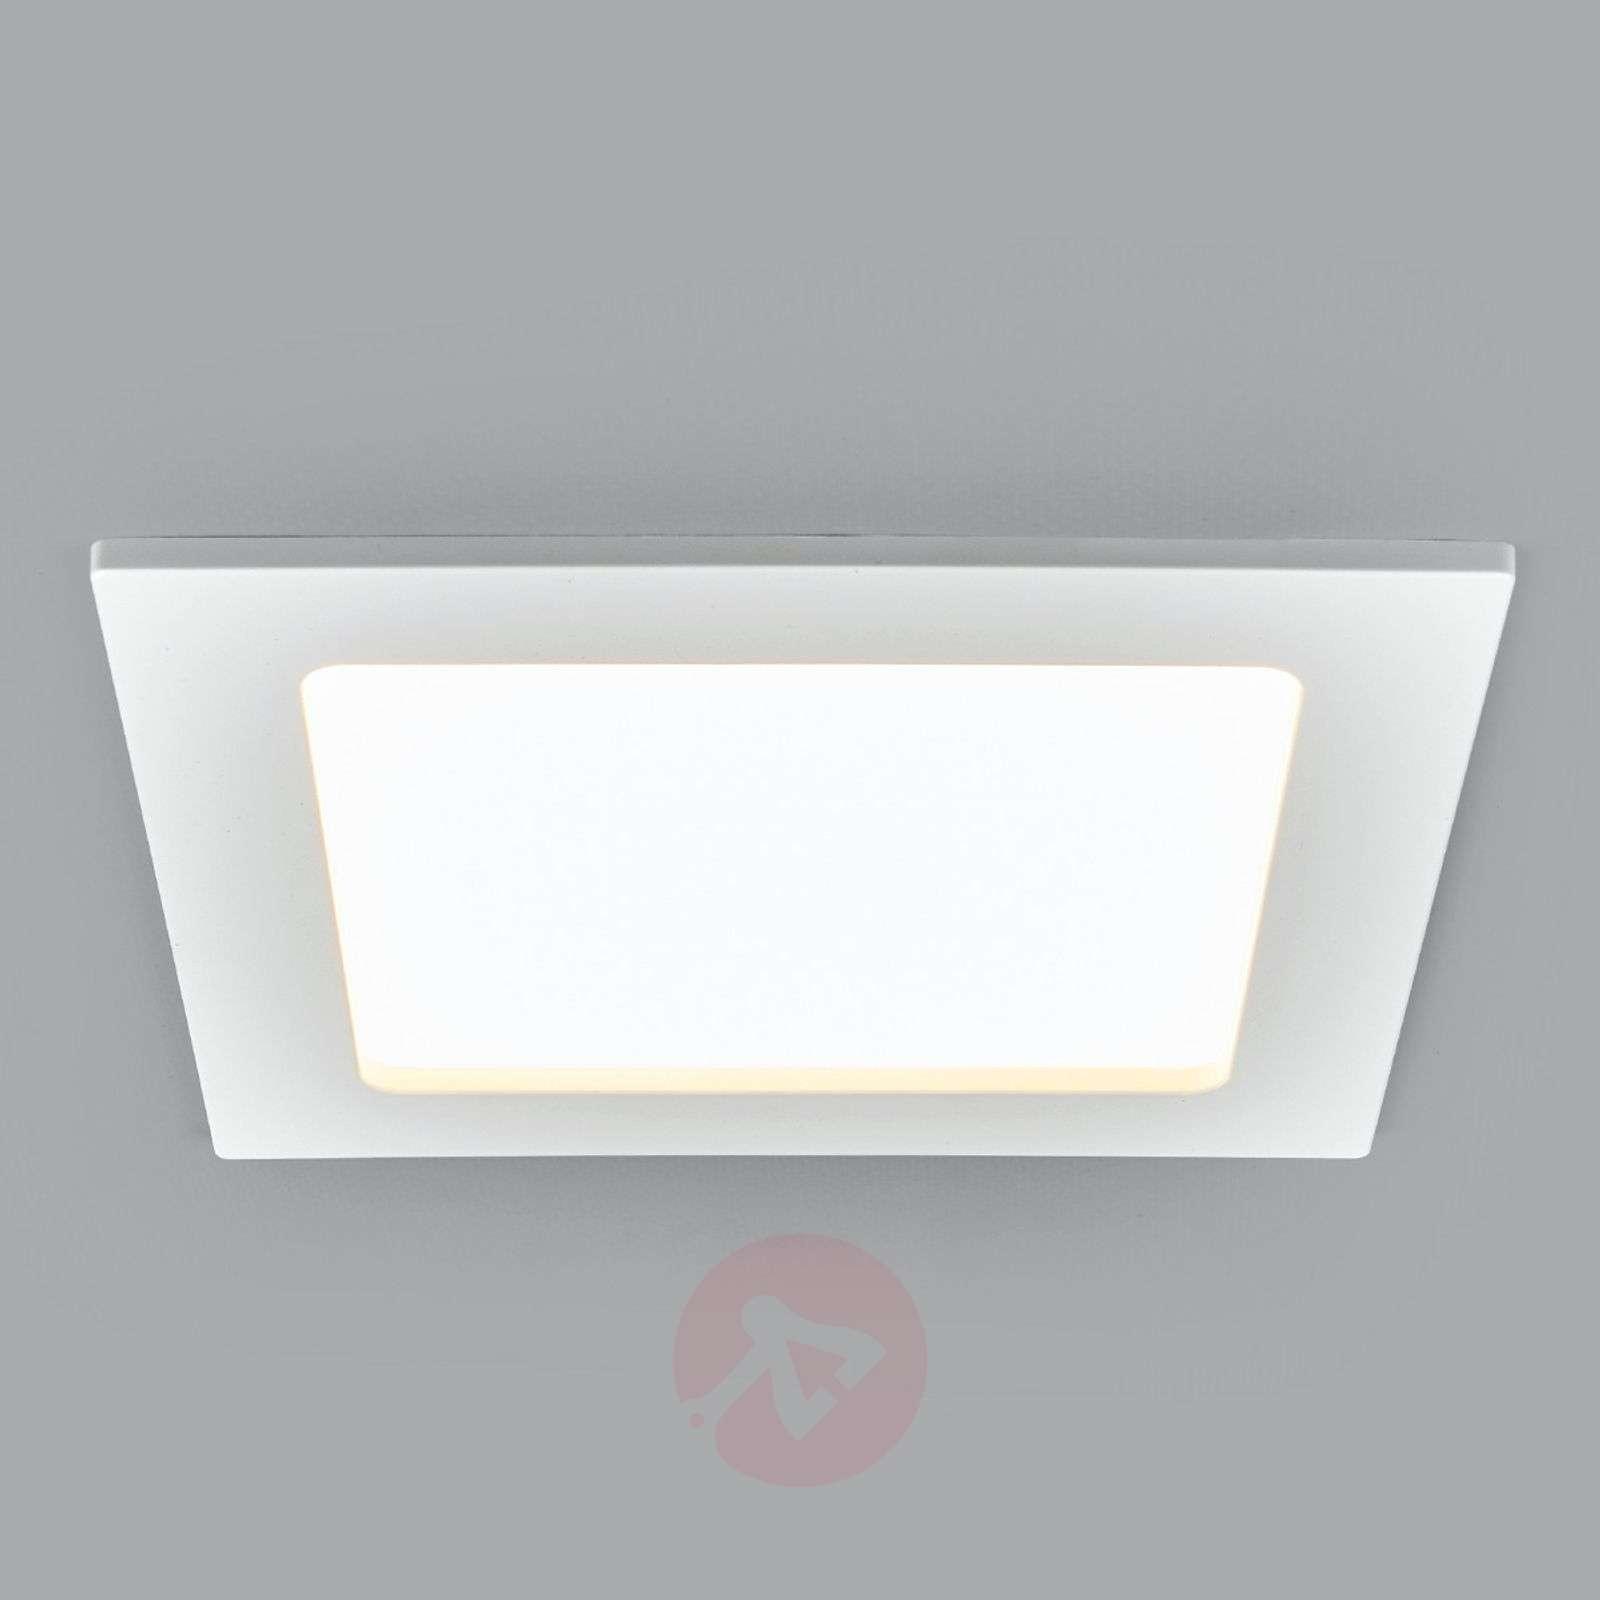 Hillitty upotettu LED-kohdevalaisin Feva, 10,5W-9978017-019